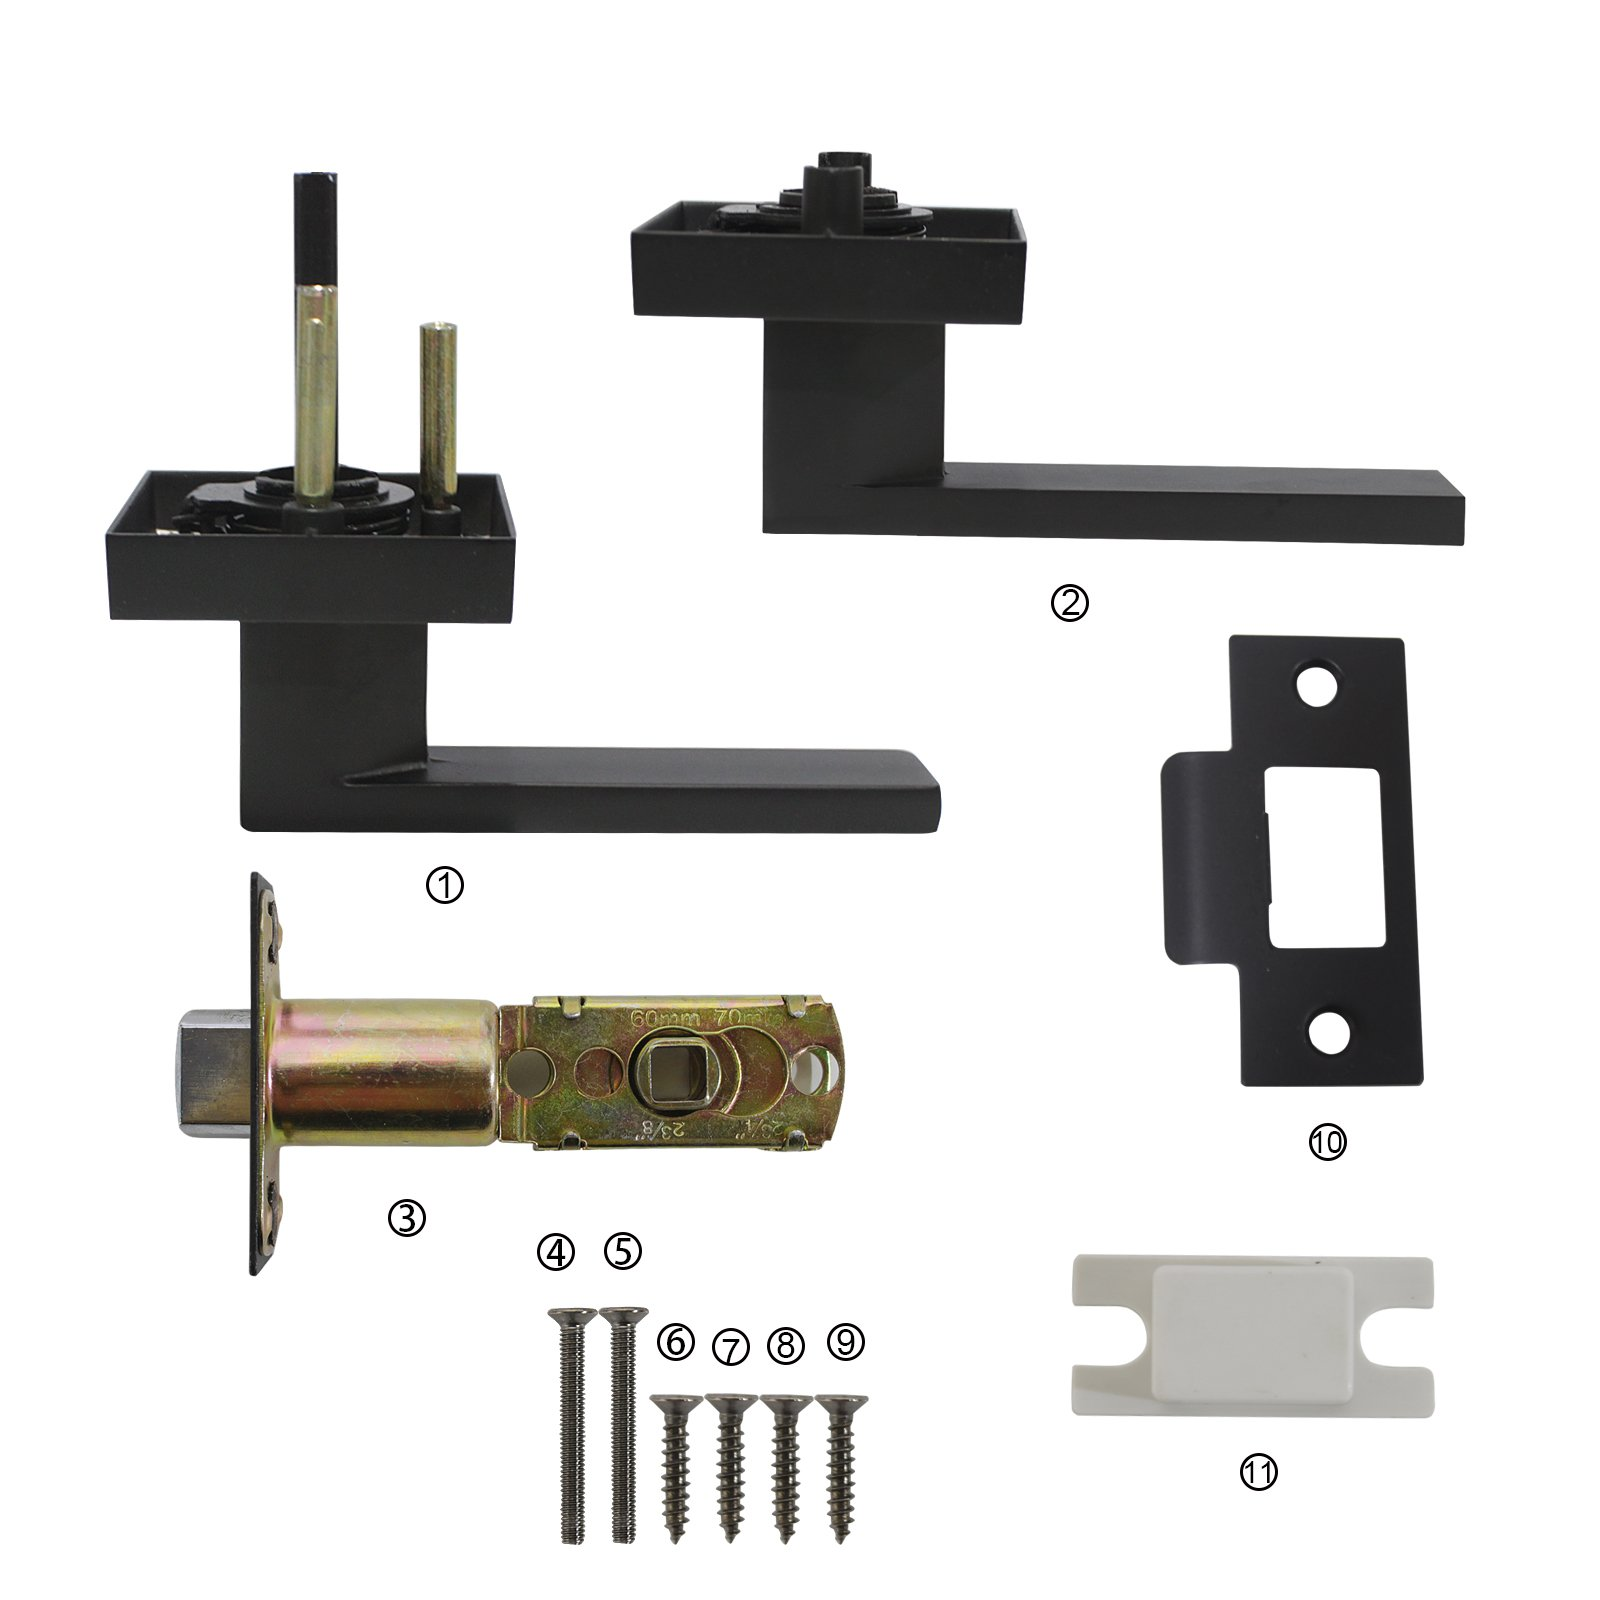 5 Pack Probrico Square Door Lever Door Lock Handle Lockset Keyless Doorknobs Passage Knobs Lockset Interior Hallway Passage Closet DL01-BK-PS in Black by Probrico (Image #2)